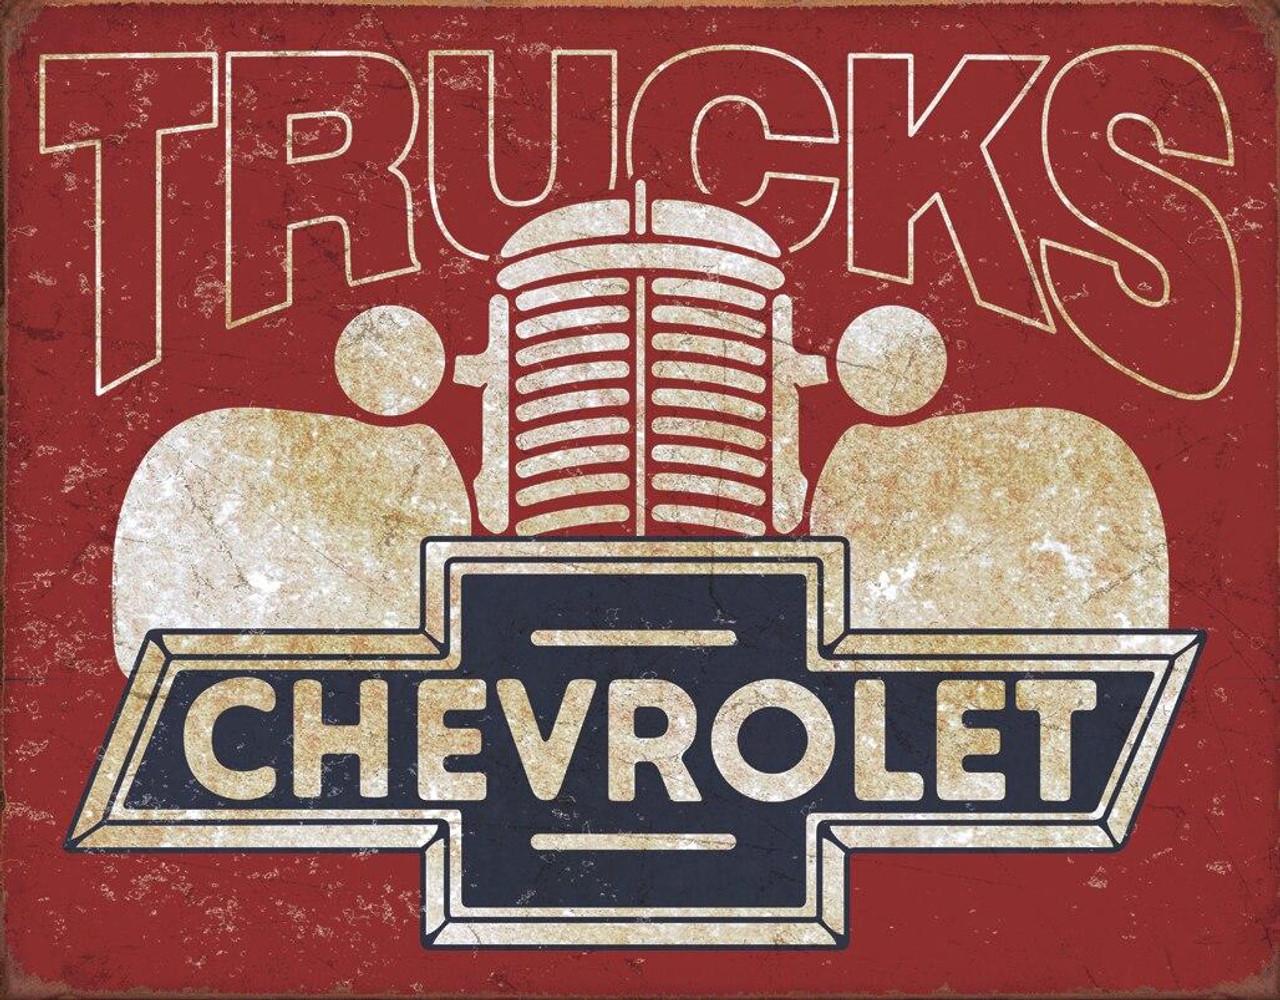 General Motors Chevy Trucks 40s